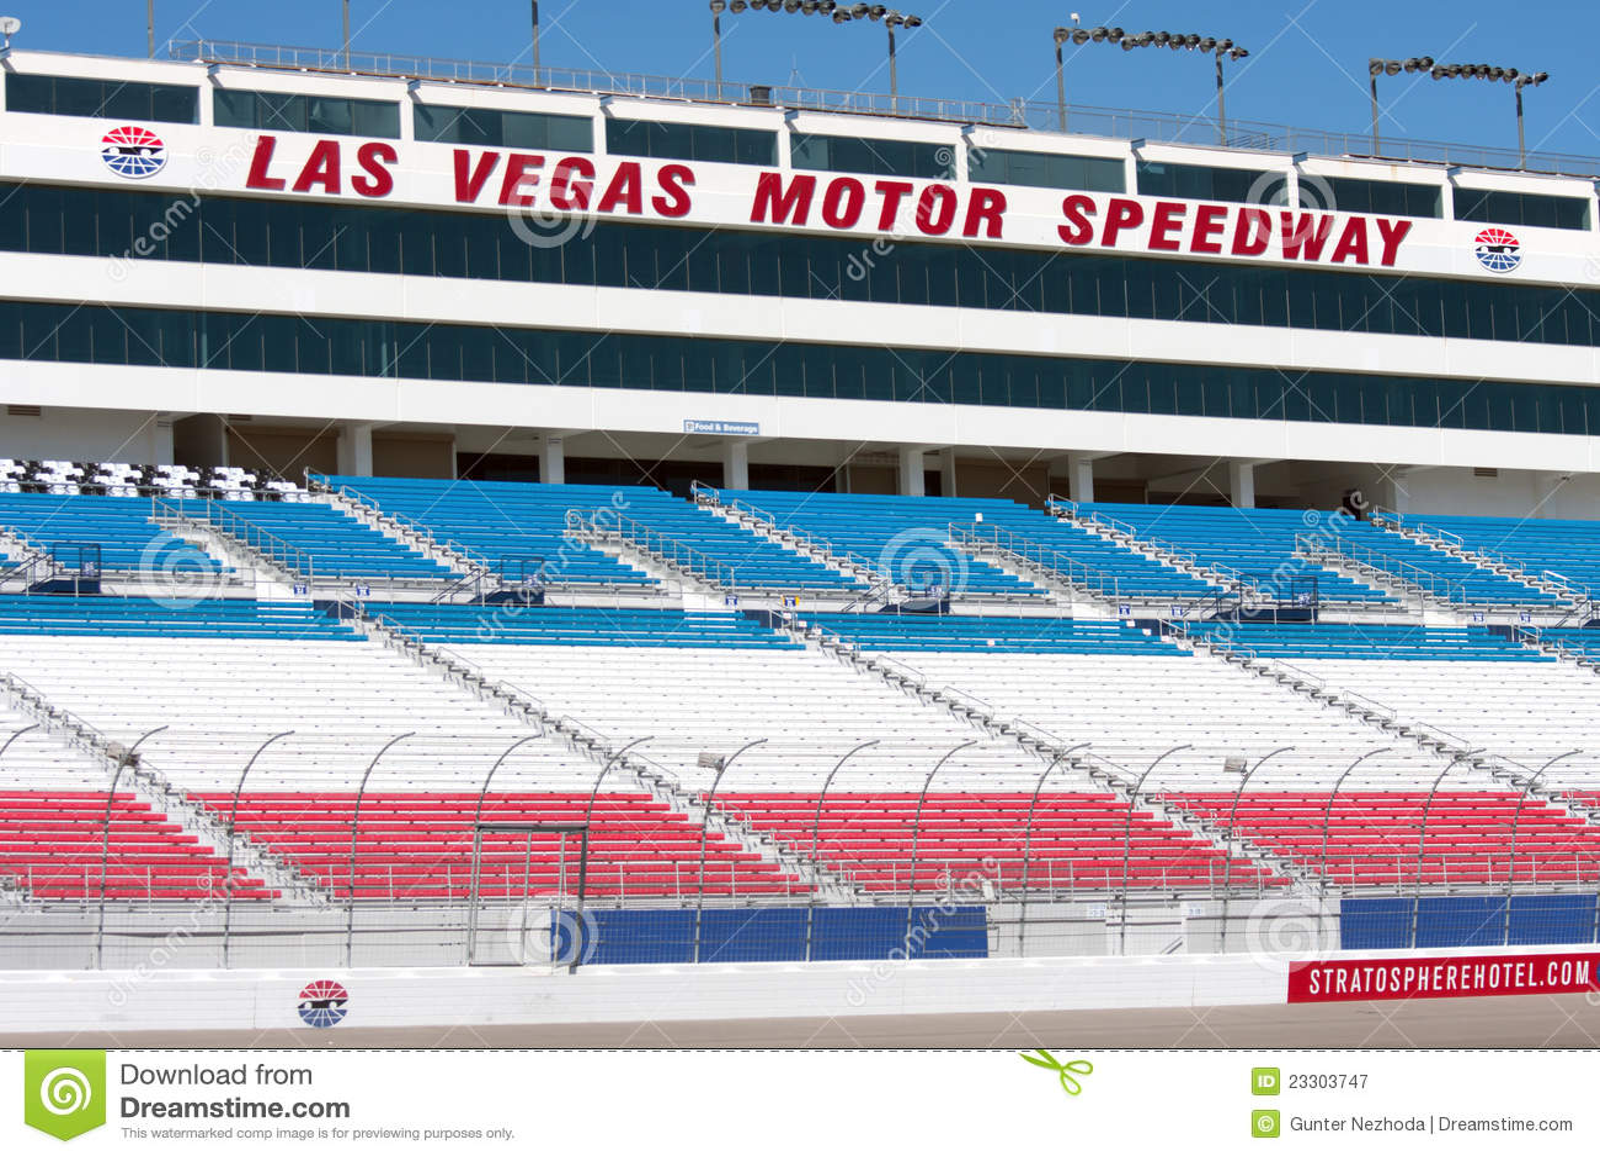 Las vegas speedway grandstand editorial photography for Hotels near las vegas motor speedway